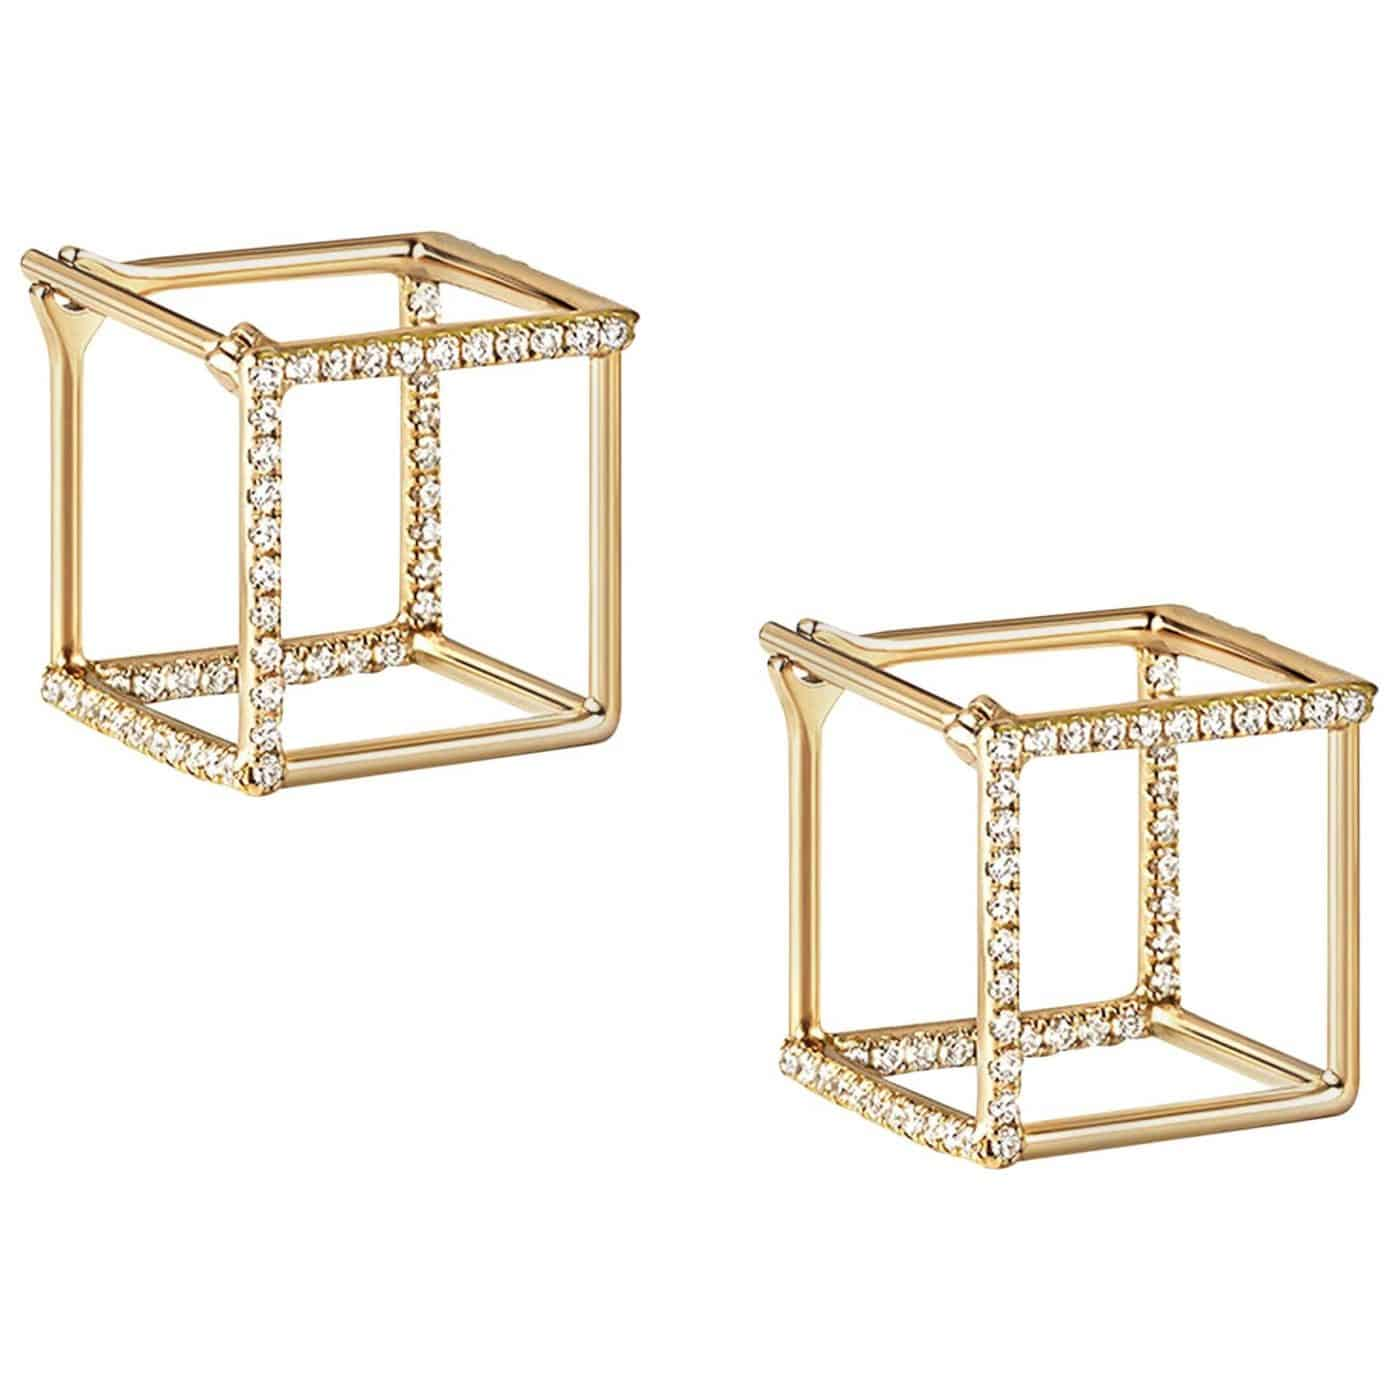 18 Karat Yellow Gold Diamond Square Pair of Earrings